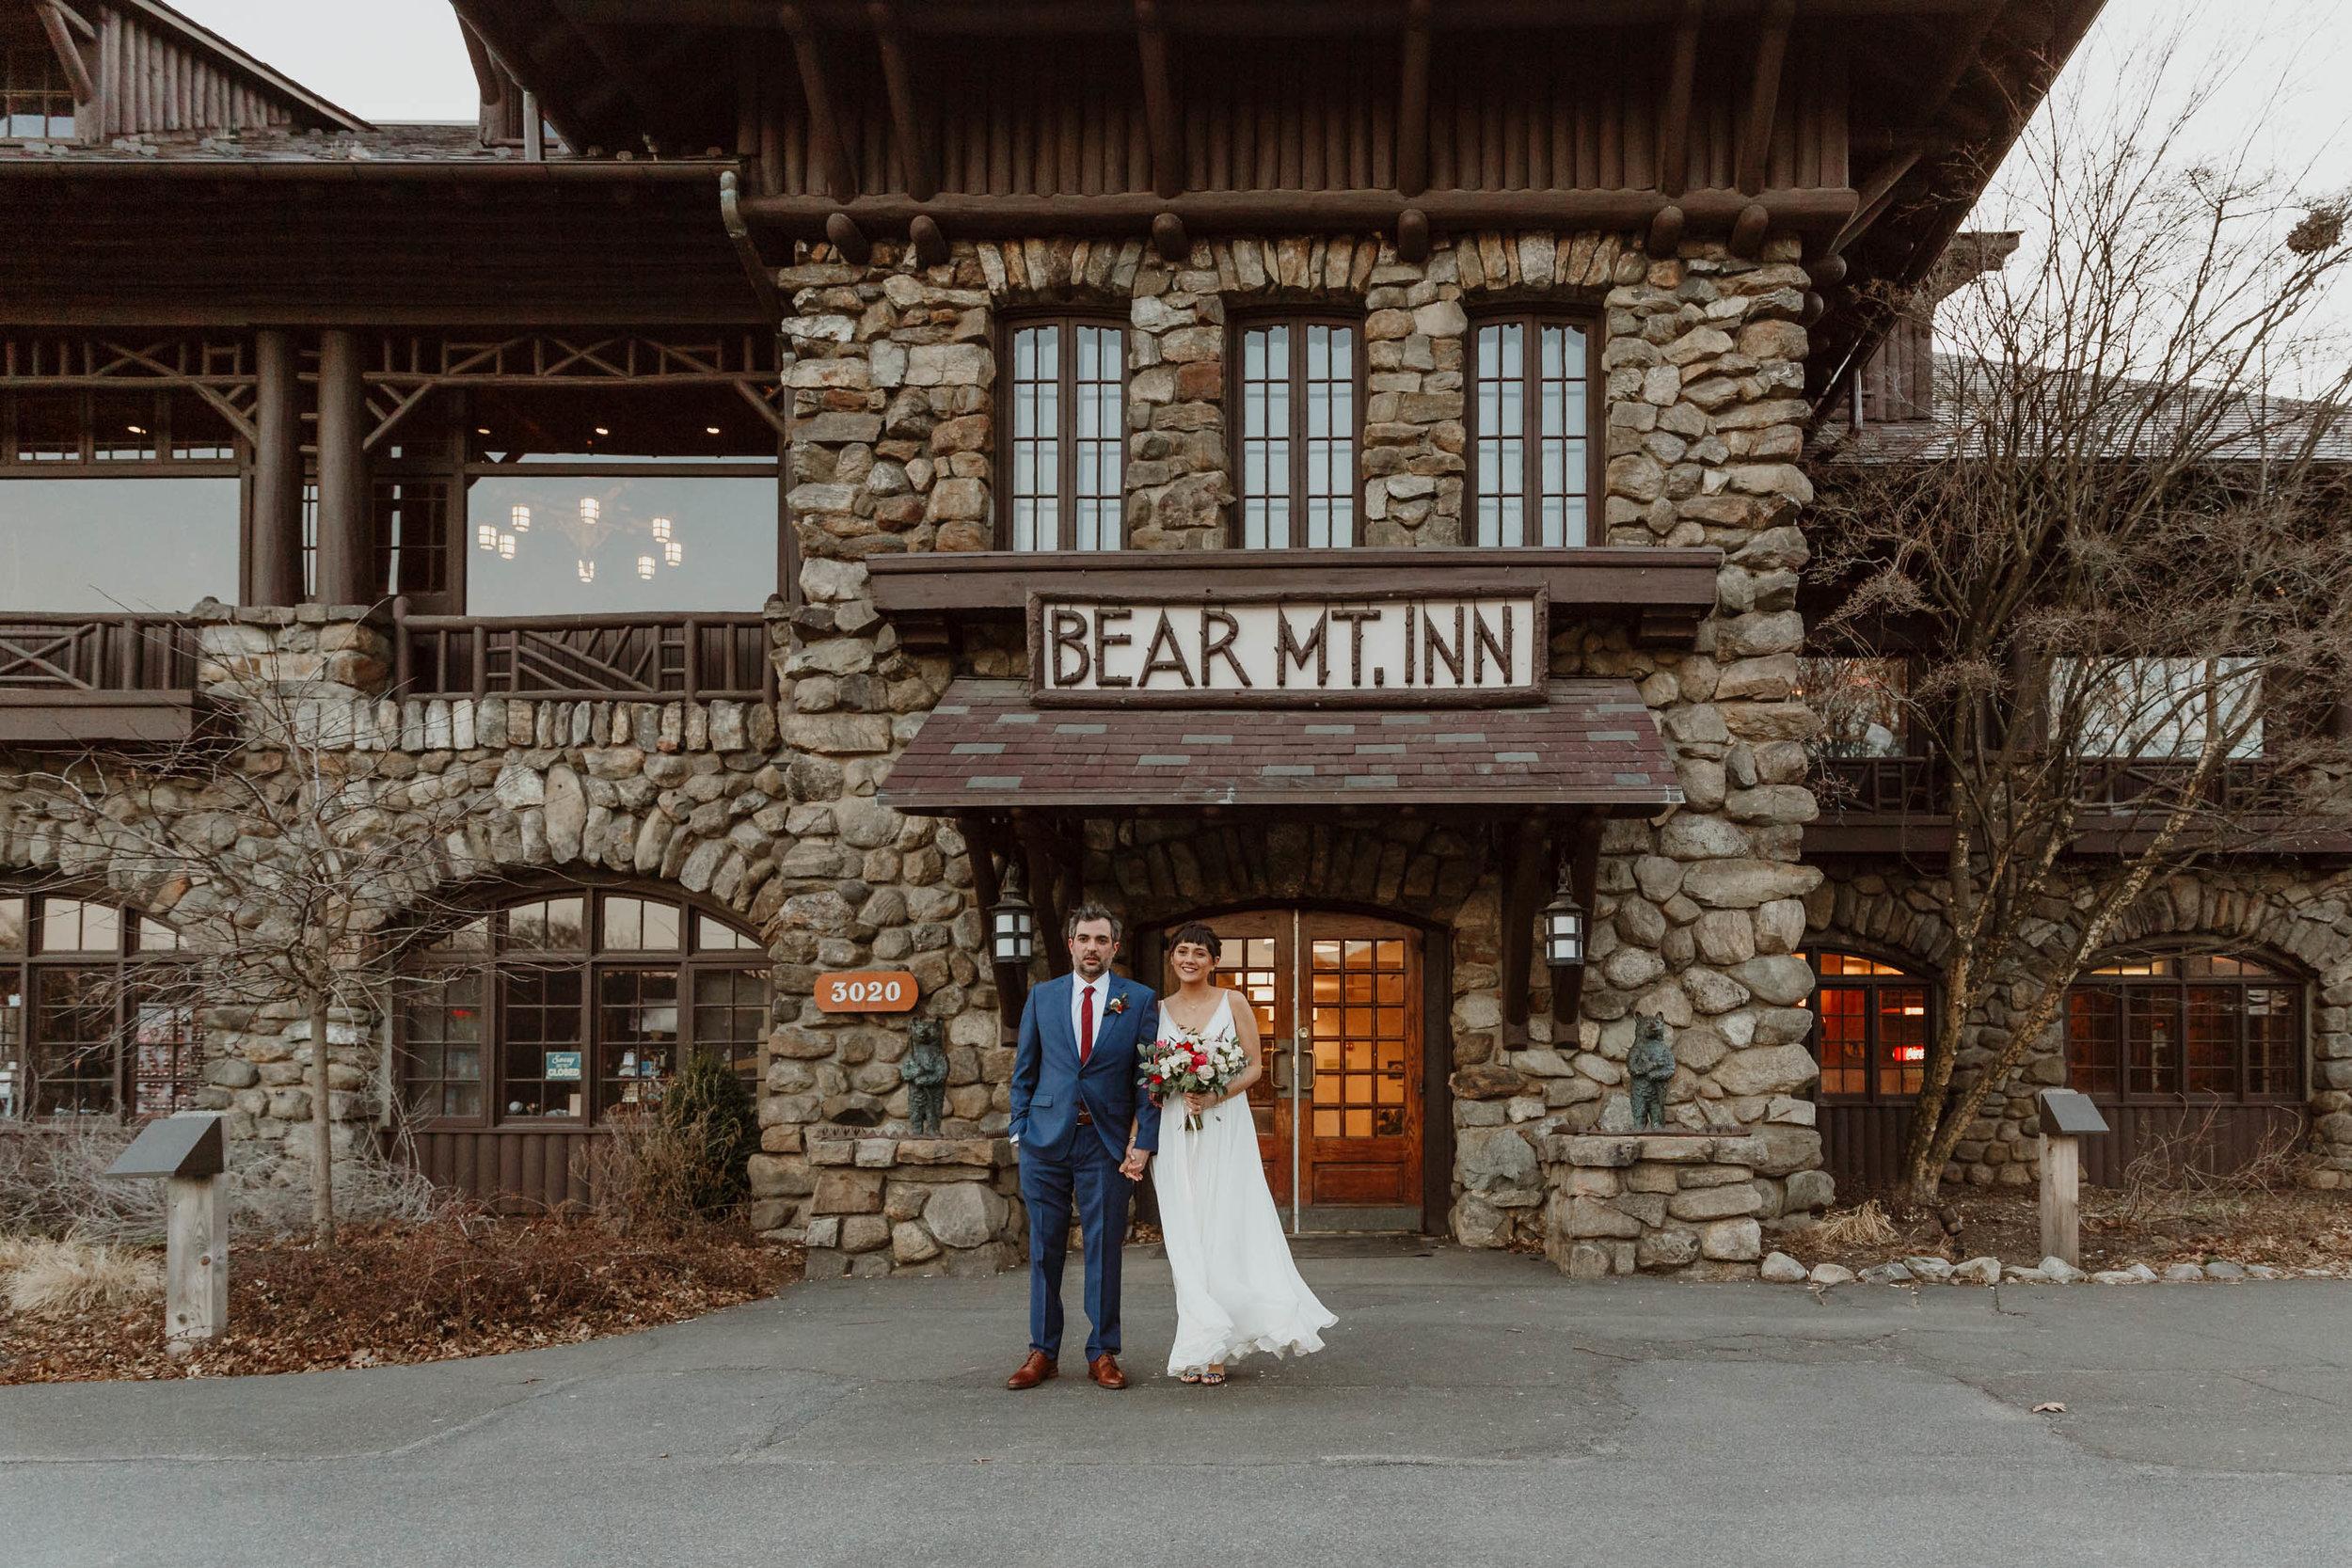 Bear Mountain Inn Rustic wedding photographer elizabeth tsung photo